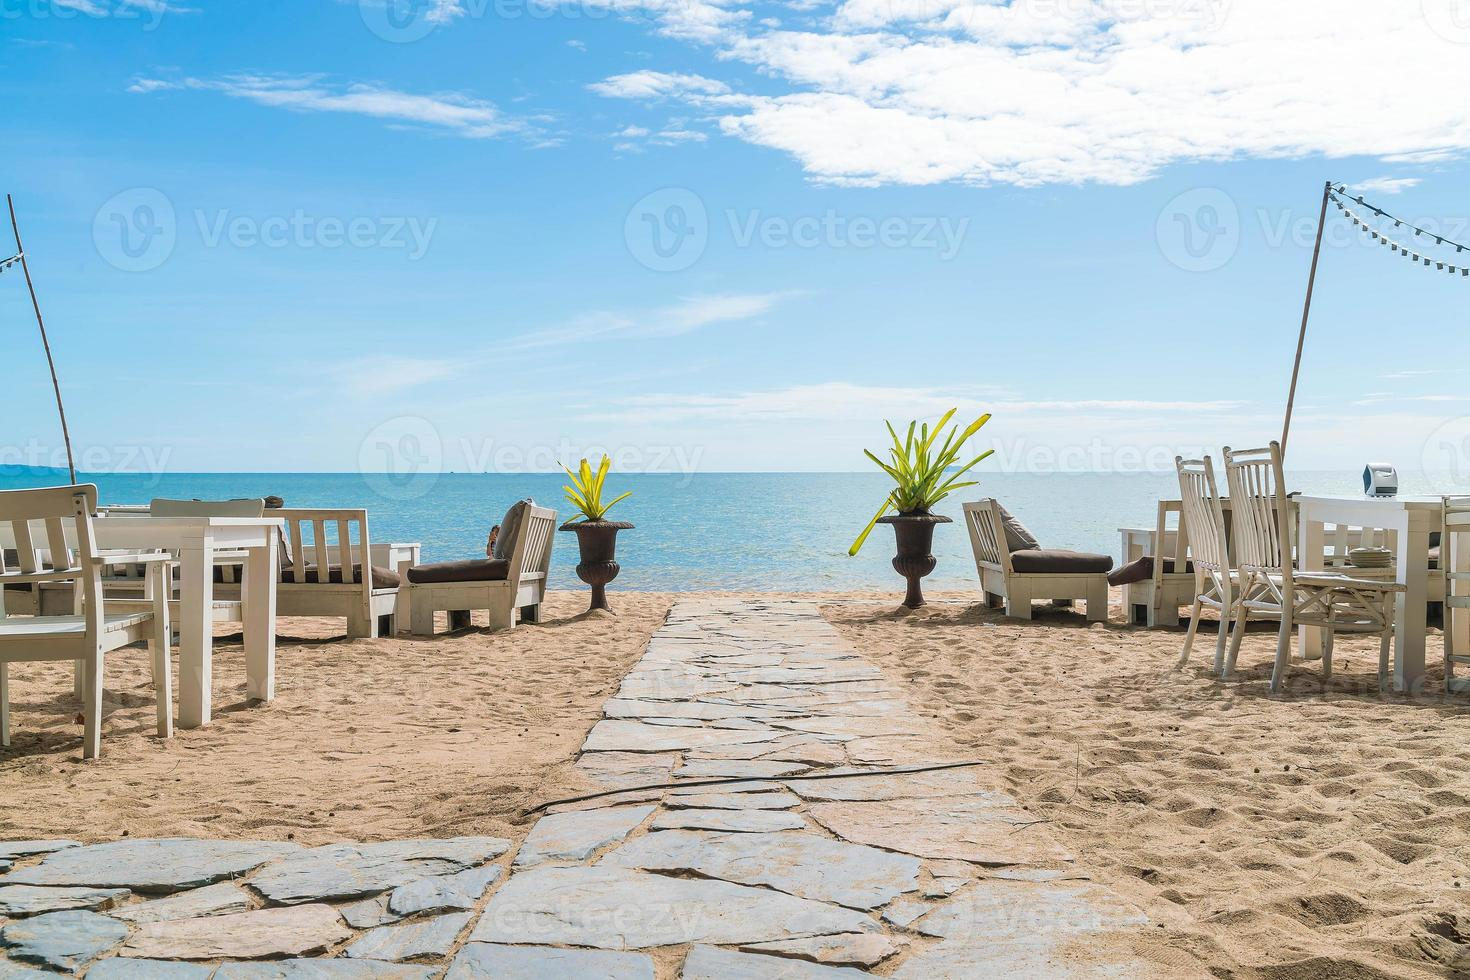 Walkway with sky and sea background photo